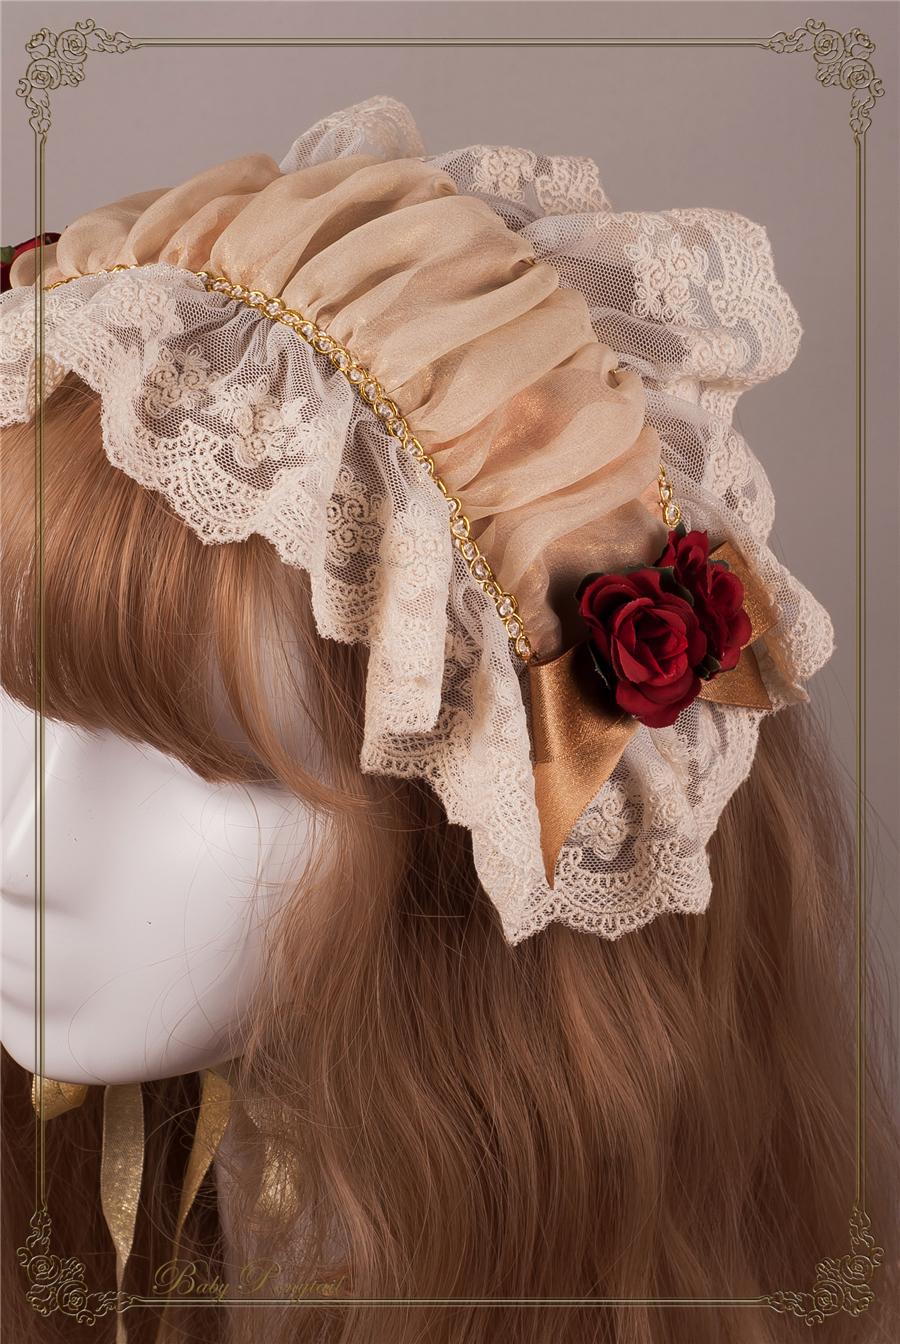 BabyPonytail_Rose Battle_Stock Photo_Petite Rose Head Dress Amber_4.jpg